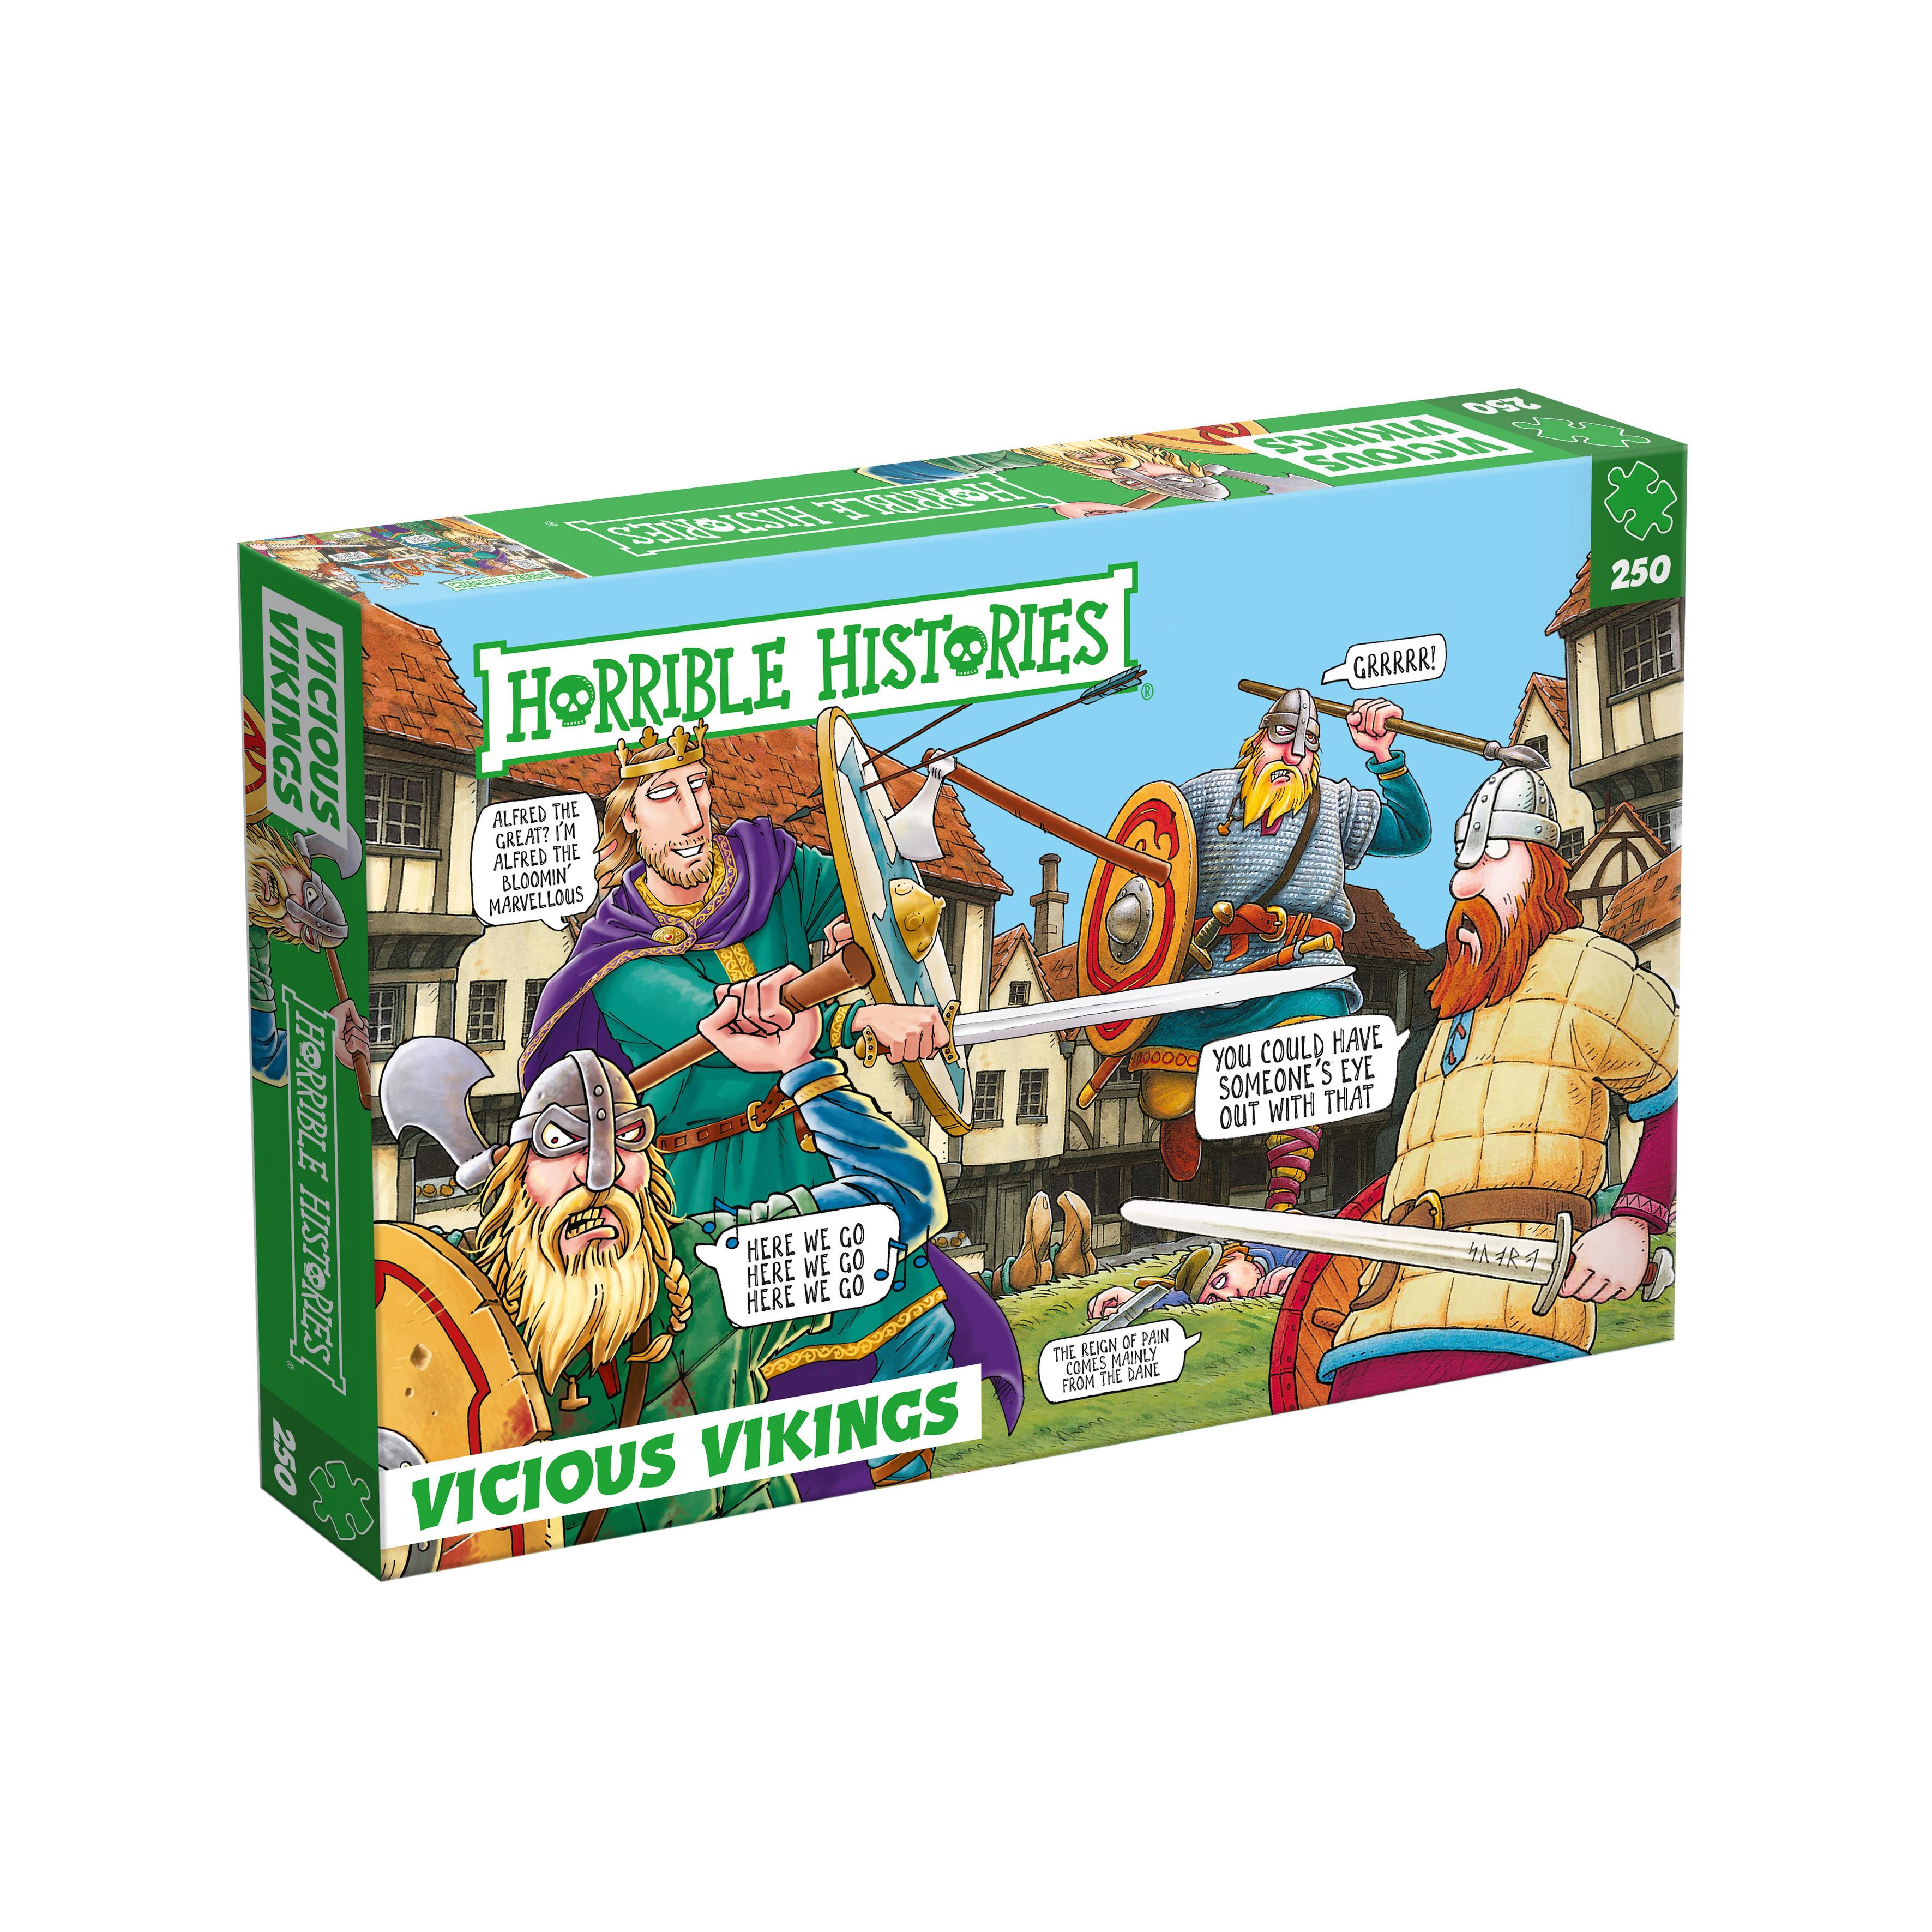 Horrible histories jigsaw puzzle (vicious Vikings)